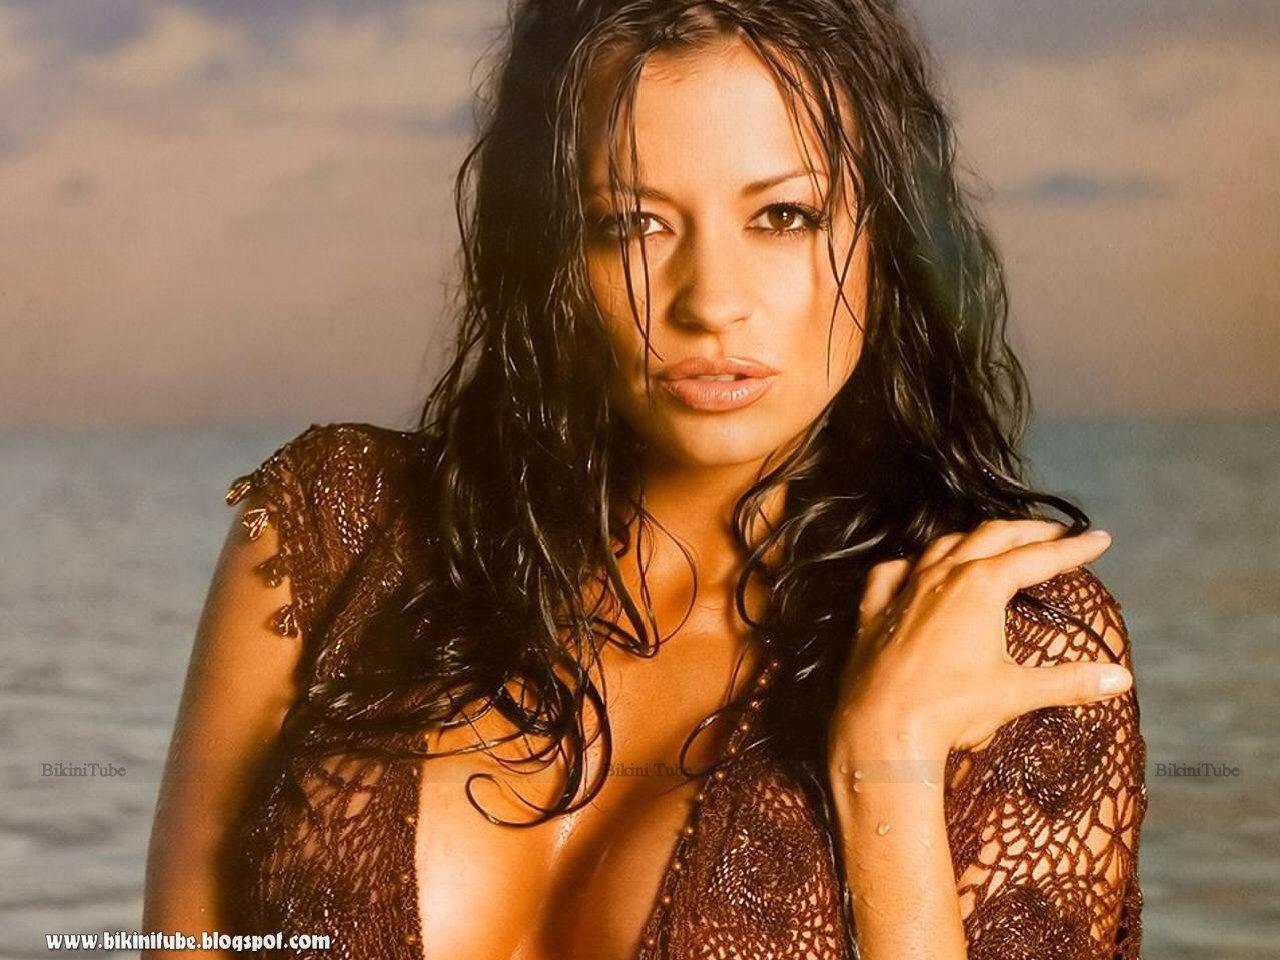 Wwe Candice Michelle Porn Good candicemichelle's blog